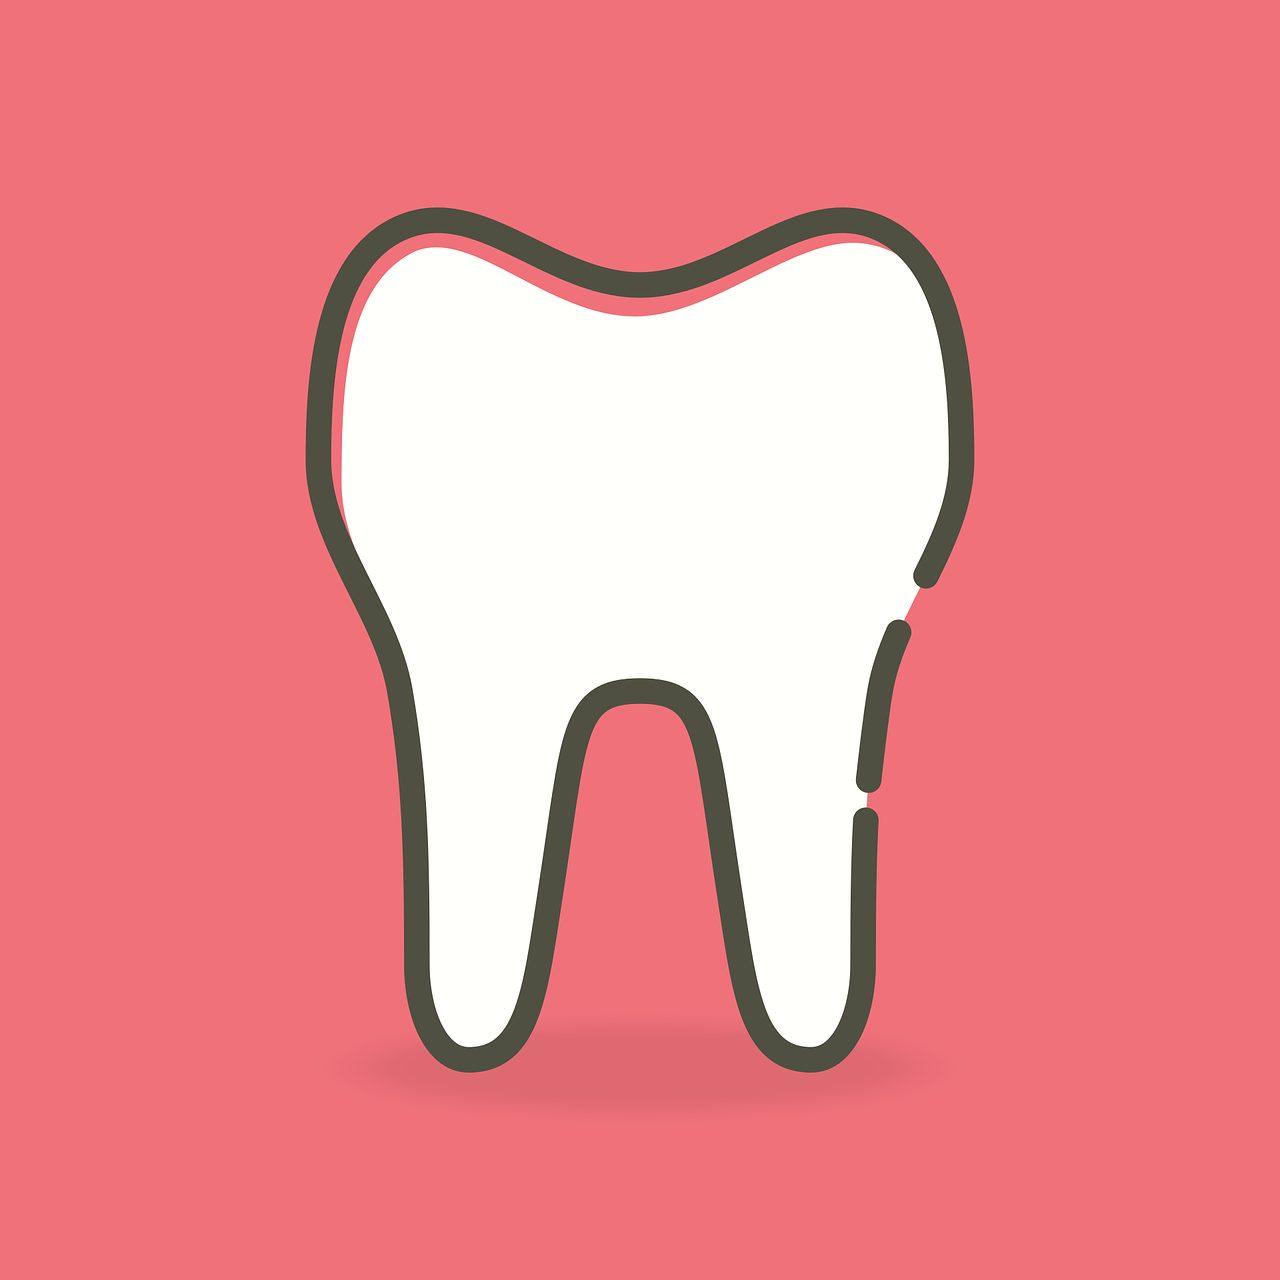 Berg Tandartsenpraktijk R J vd tandarts spoed